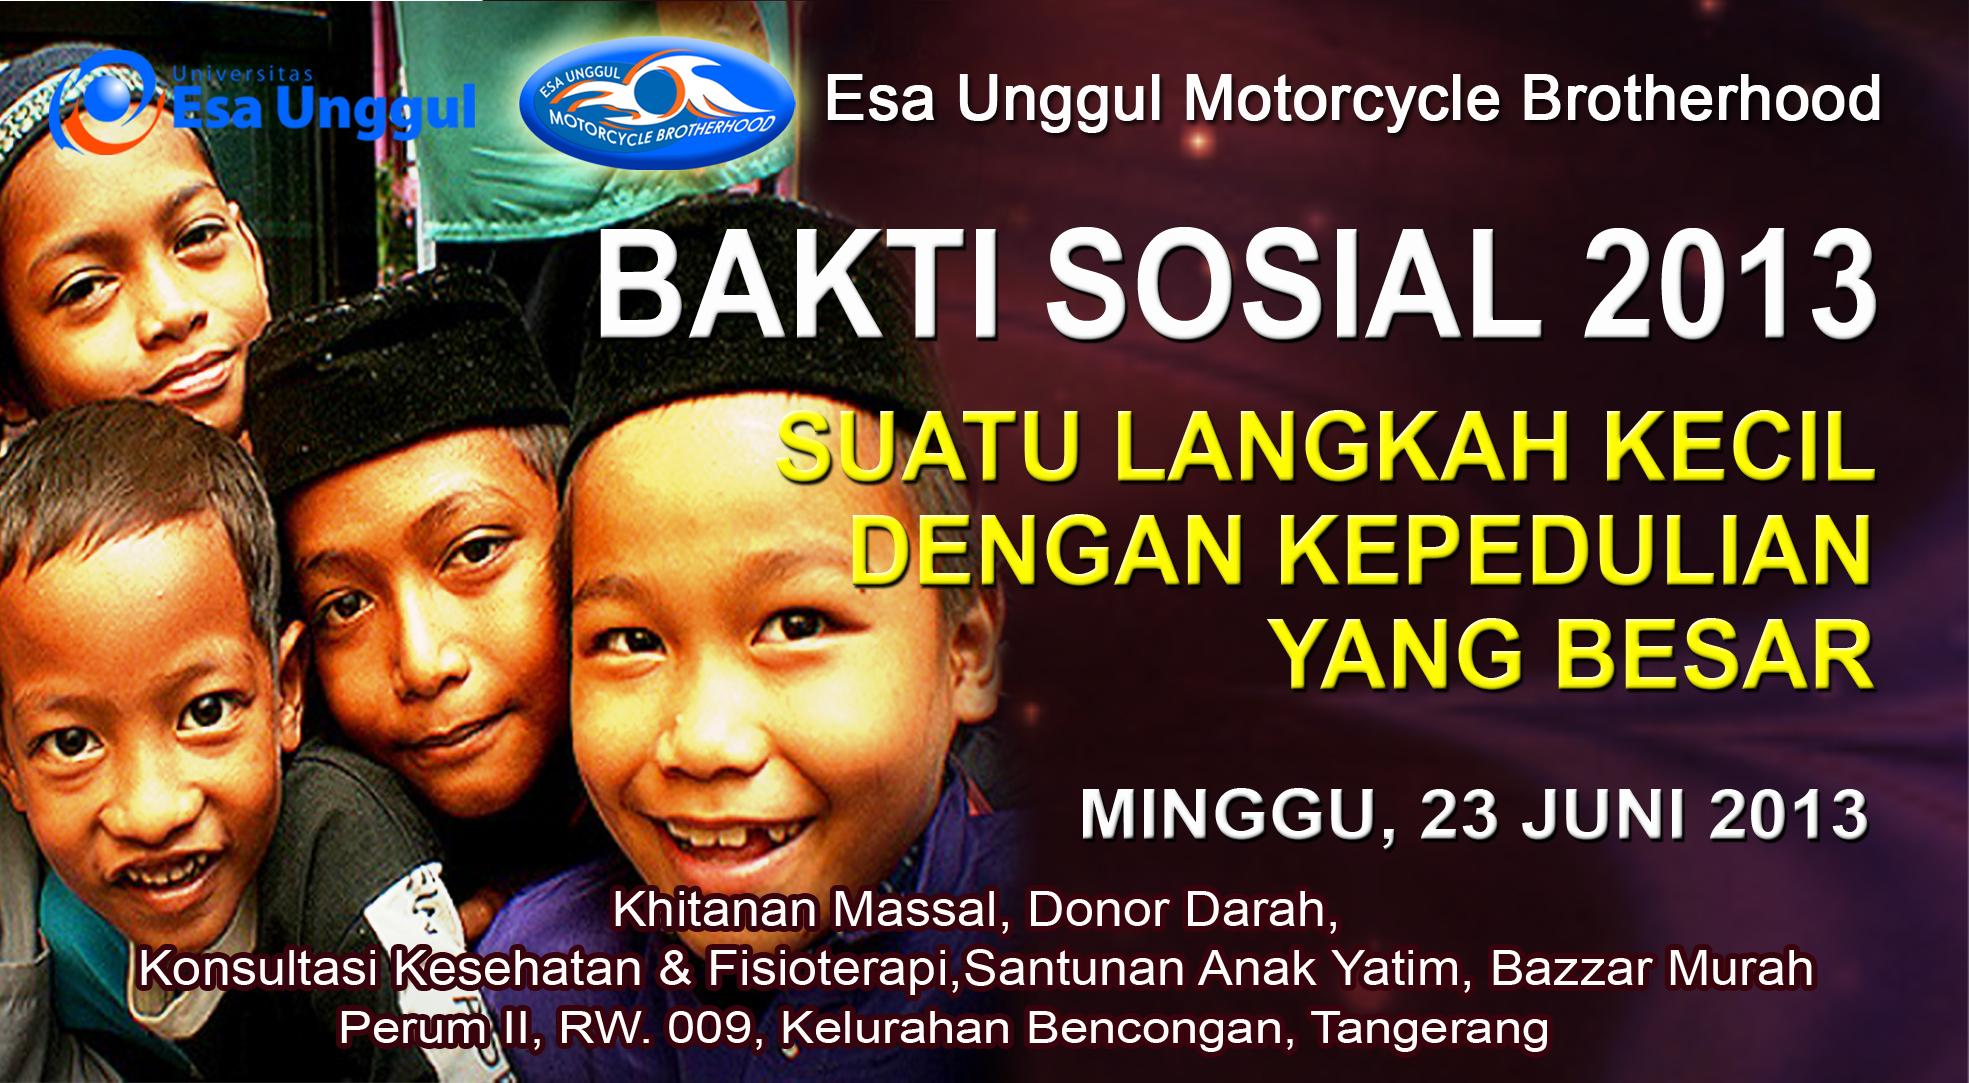 "Esa Unggul Motorcycle Brotherhood menyelenggarakan Acara Bakti Sosial dengan tema ""Suatu Langkah Kecil dengan Kepedulian yang Besar"""